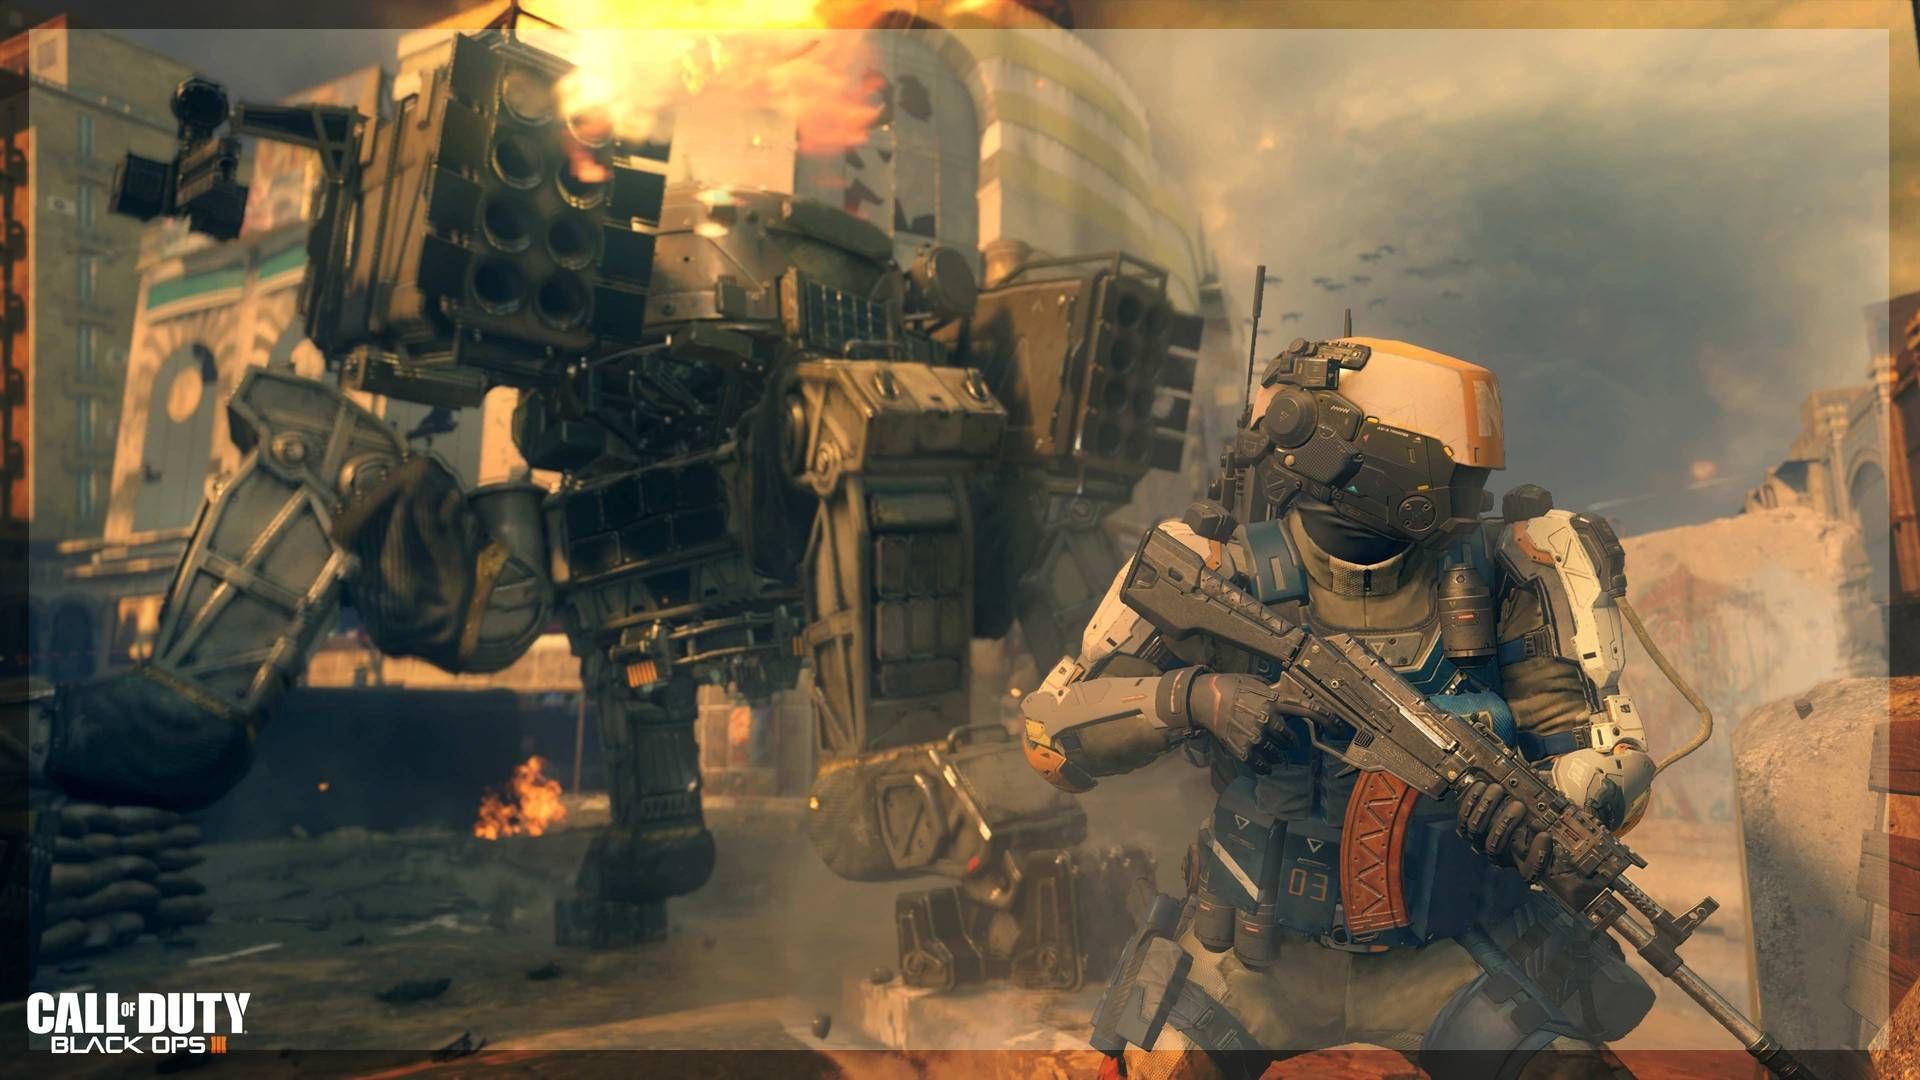 Black Ops 3 Ekran Görüntüsü Quad-Tank